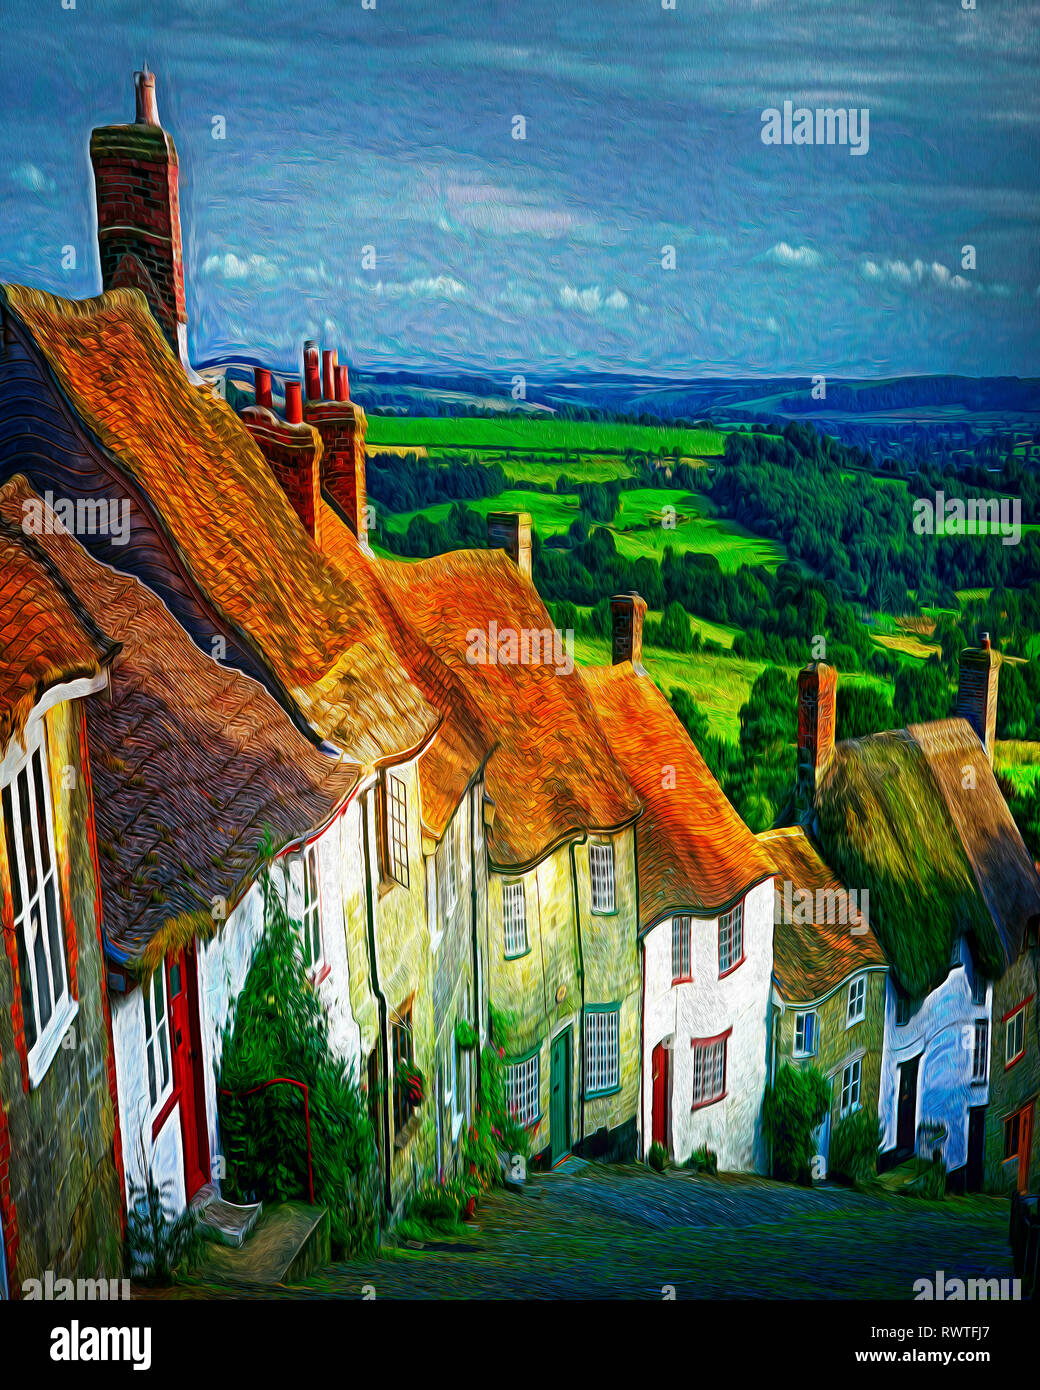 DIGITAL ART: Gold Hill at Shaftesbury, Dorset, Great Britain - Stock Image